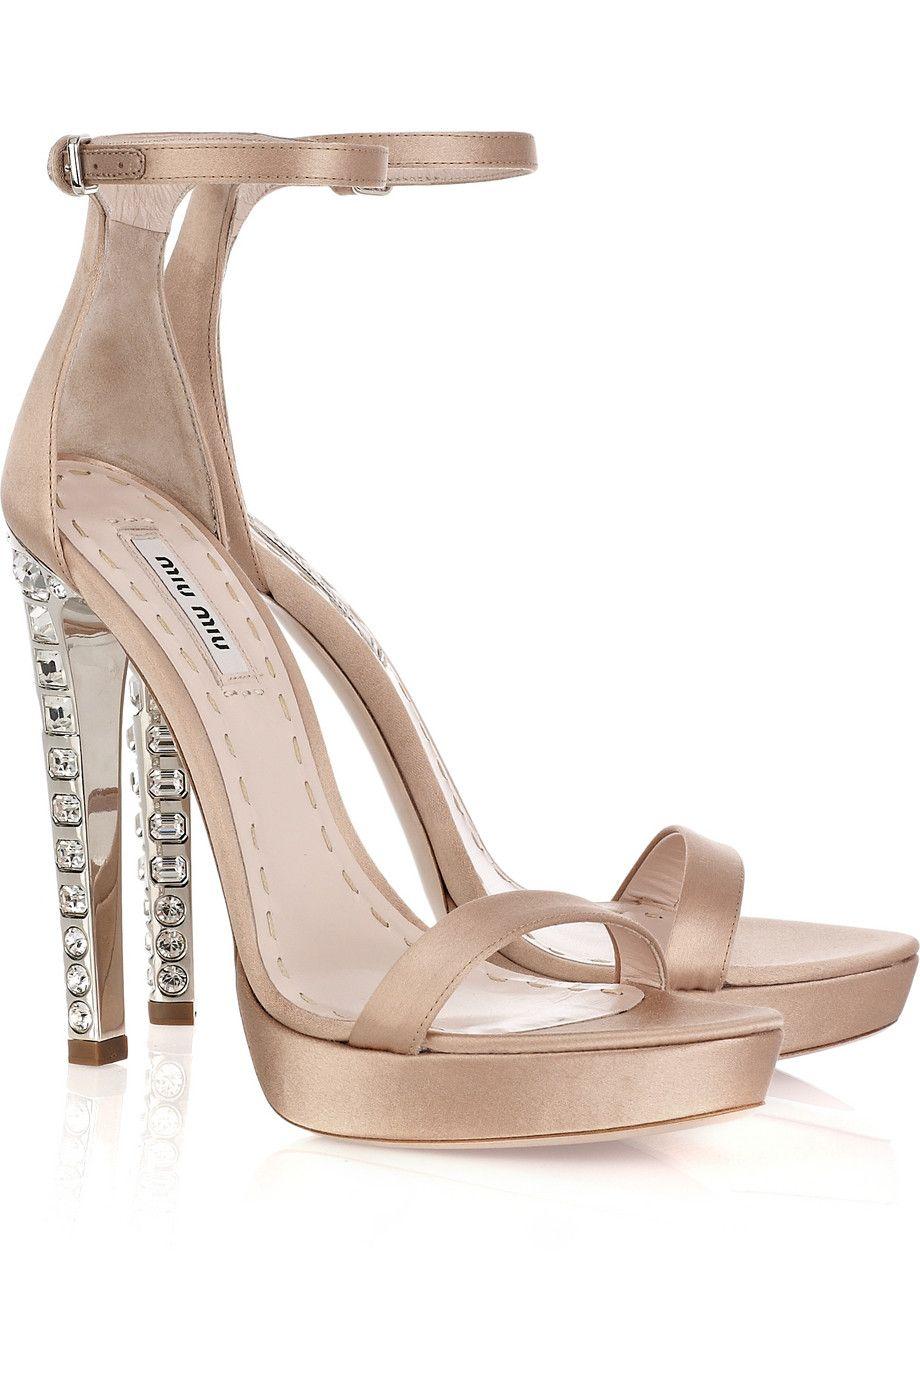 Glitter Heeled Two Part Sandals SheIn Sheinside SQWRZK4RS